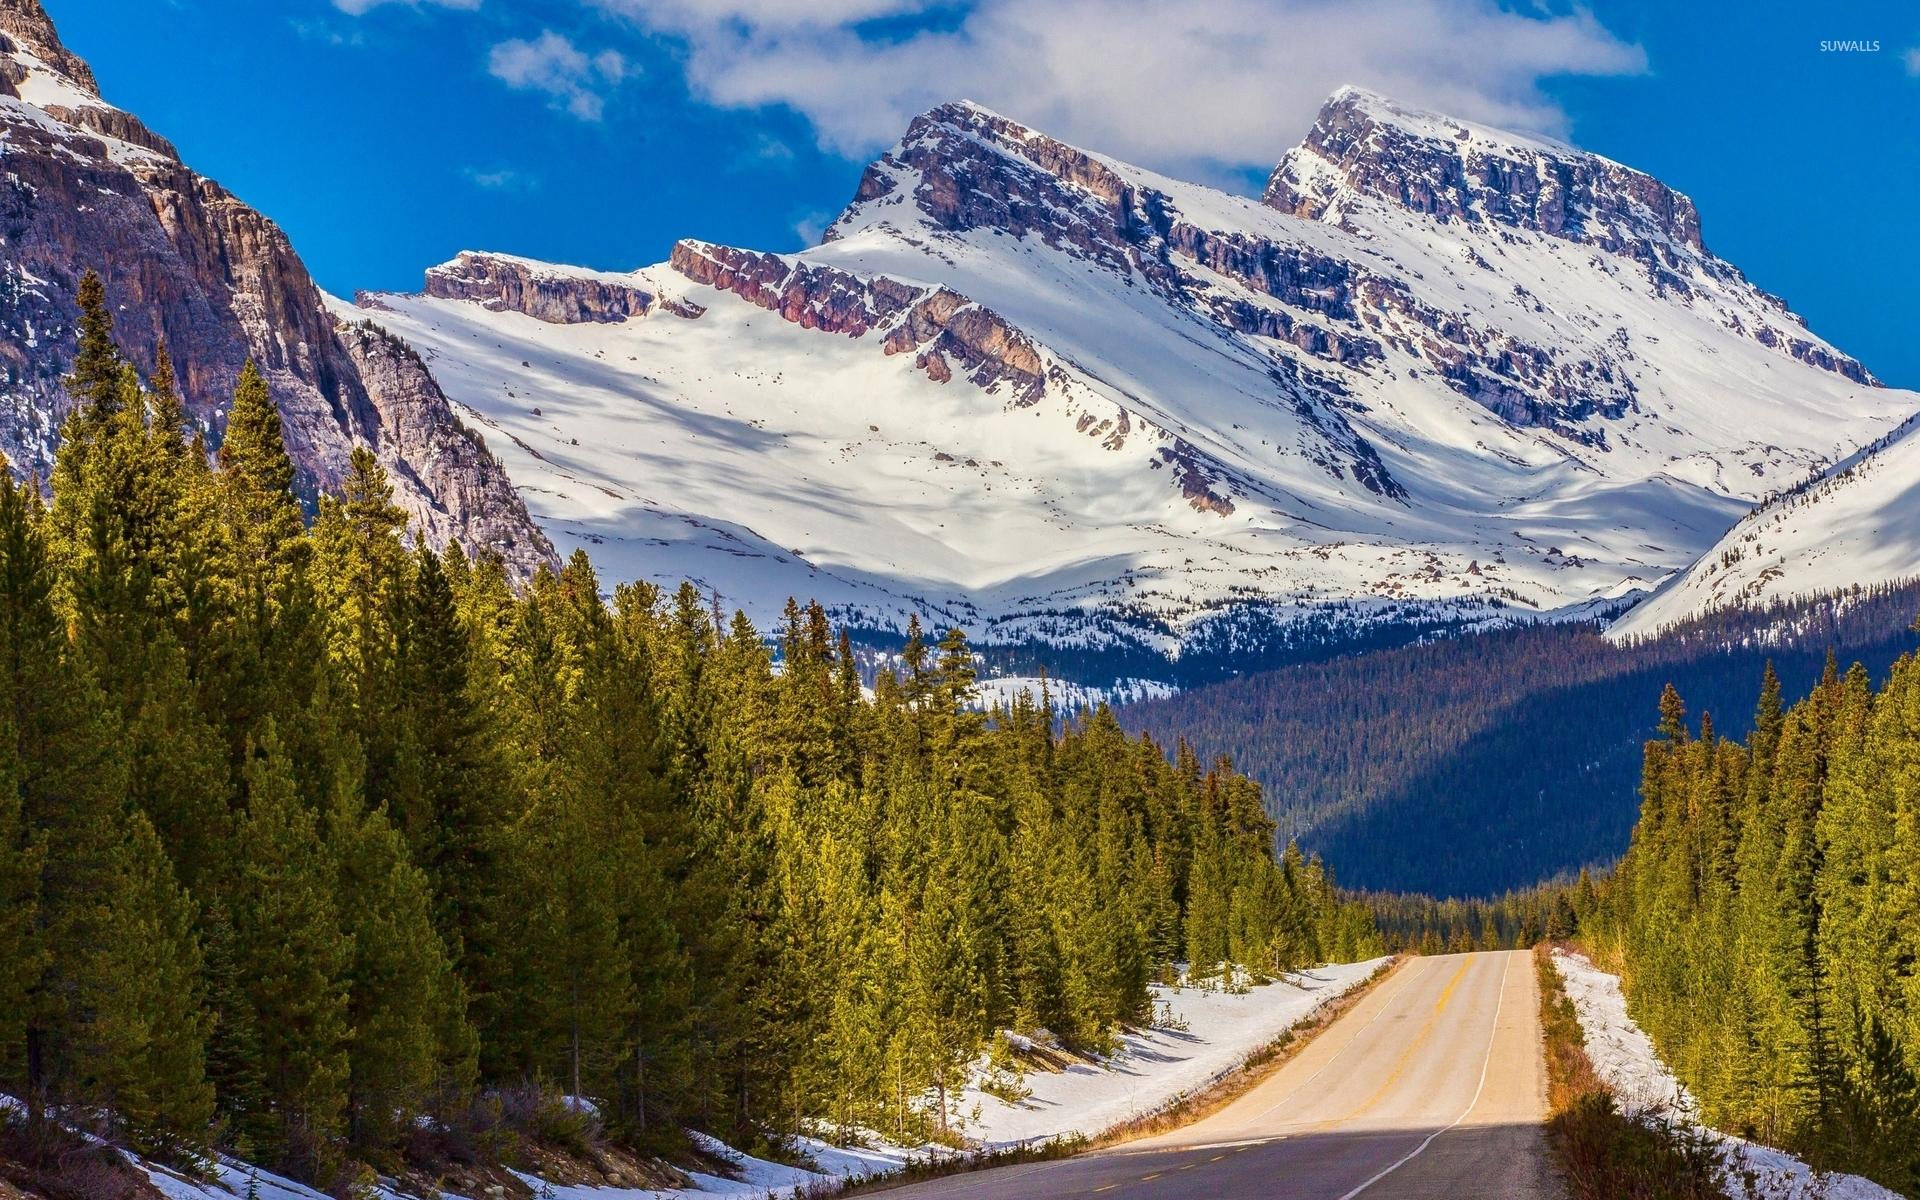 1080p Fall Wallpaper Glacier National Park 10 Wallpaper Nature Wallpapers